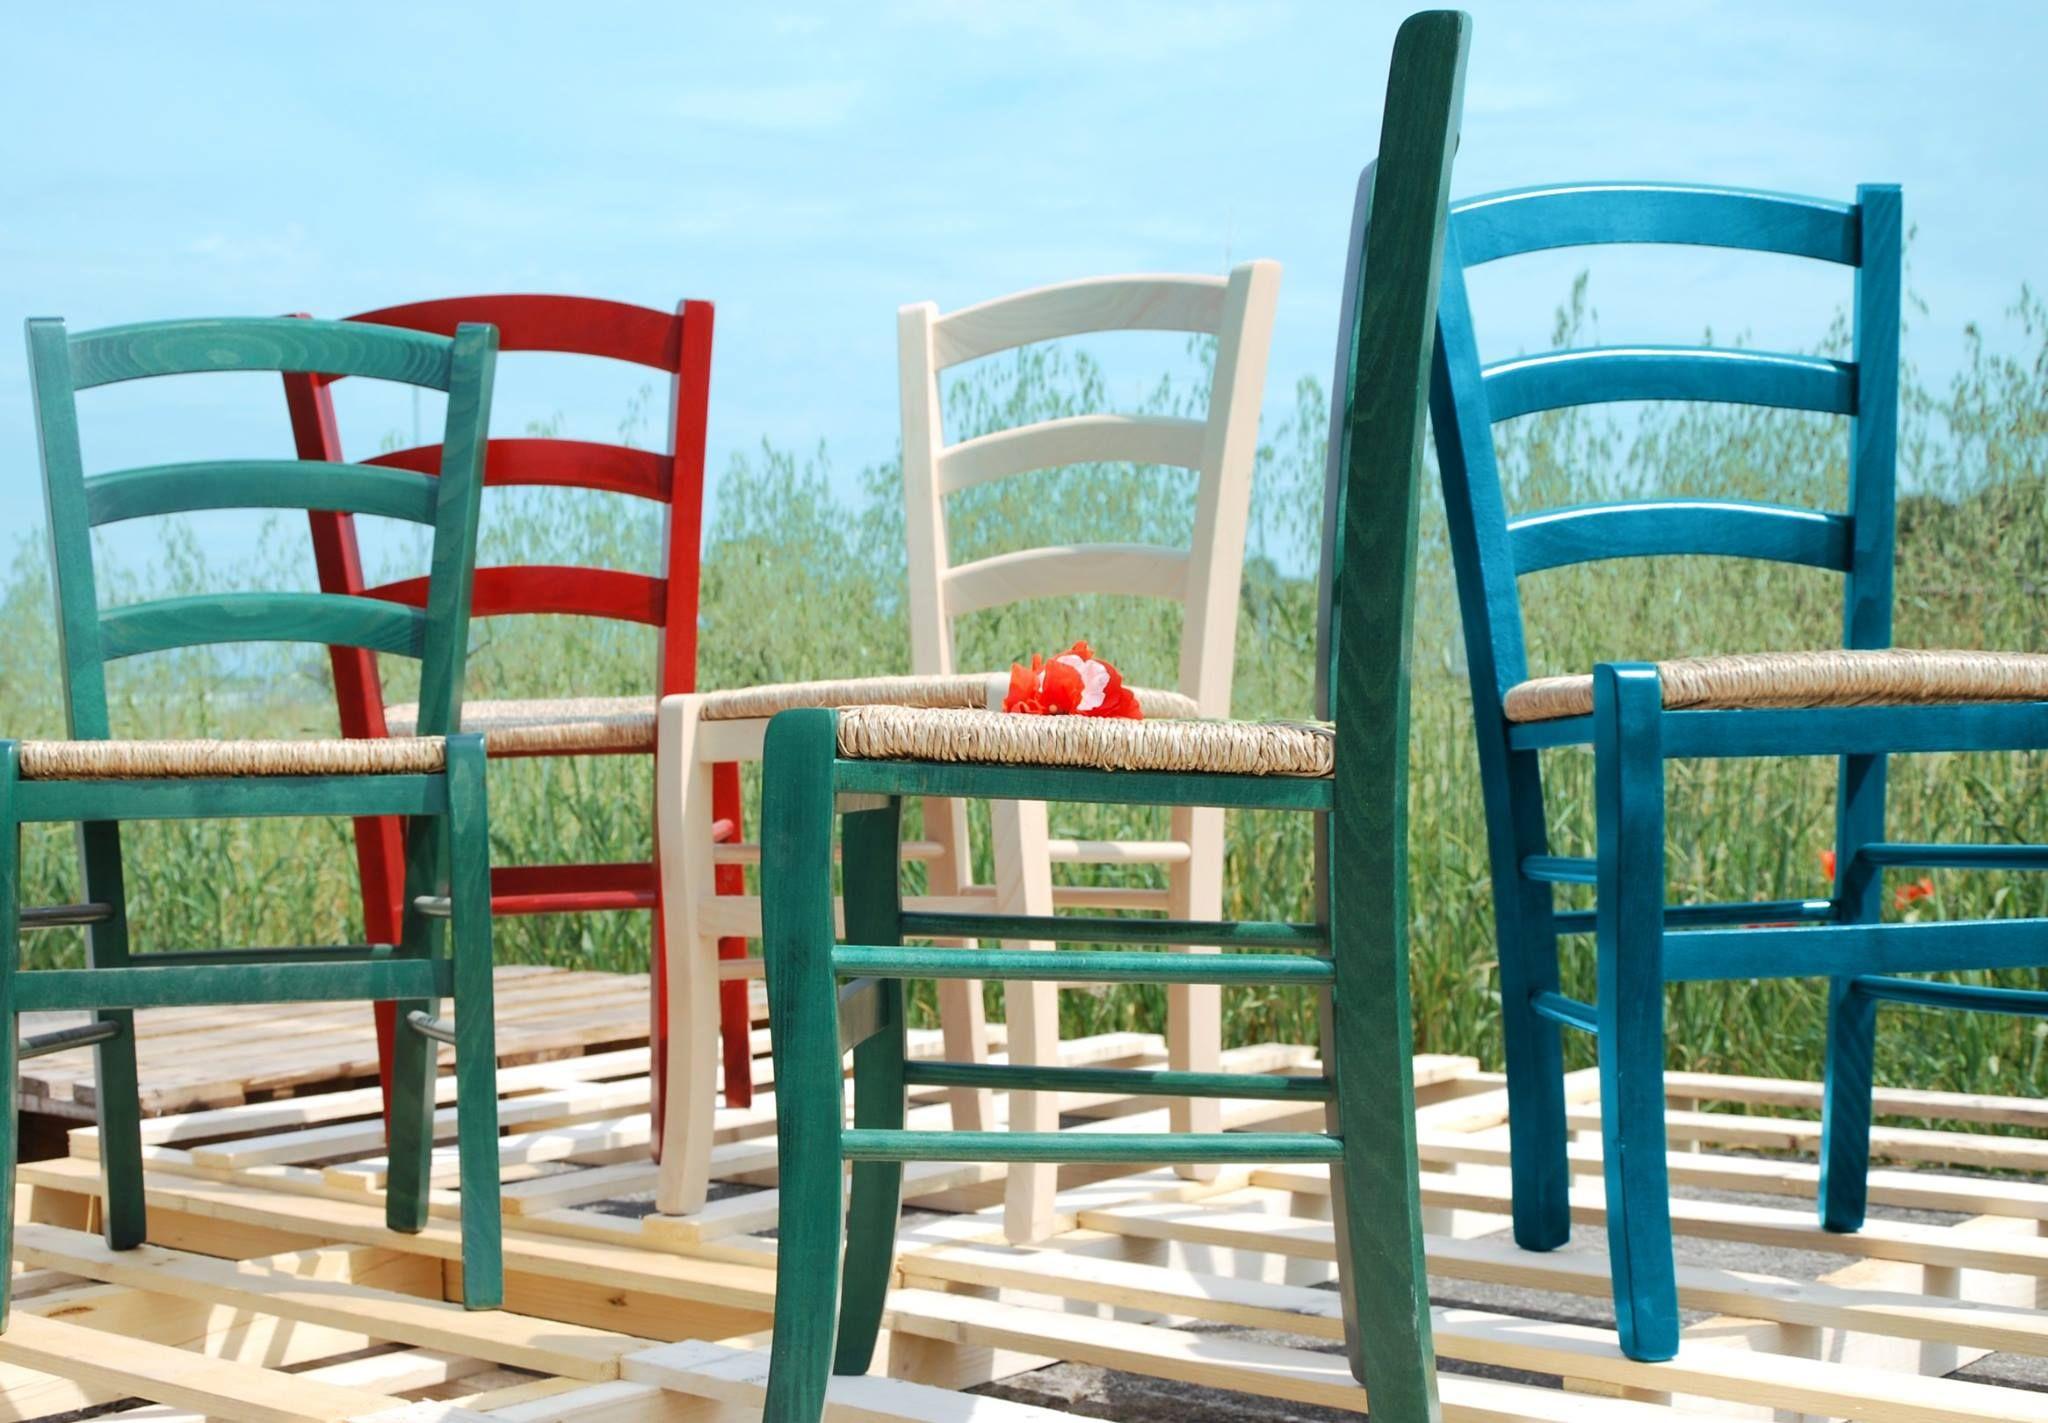 Dipingere Sedie Di Legno colorare sedie | sedia legno, sedie, sgabelli